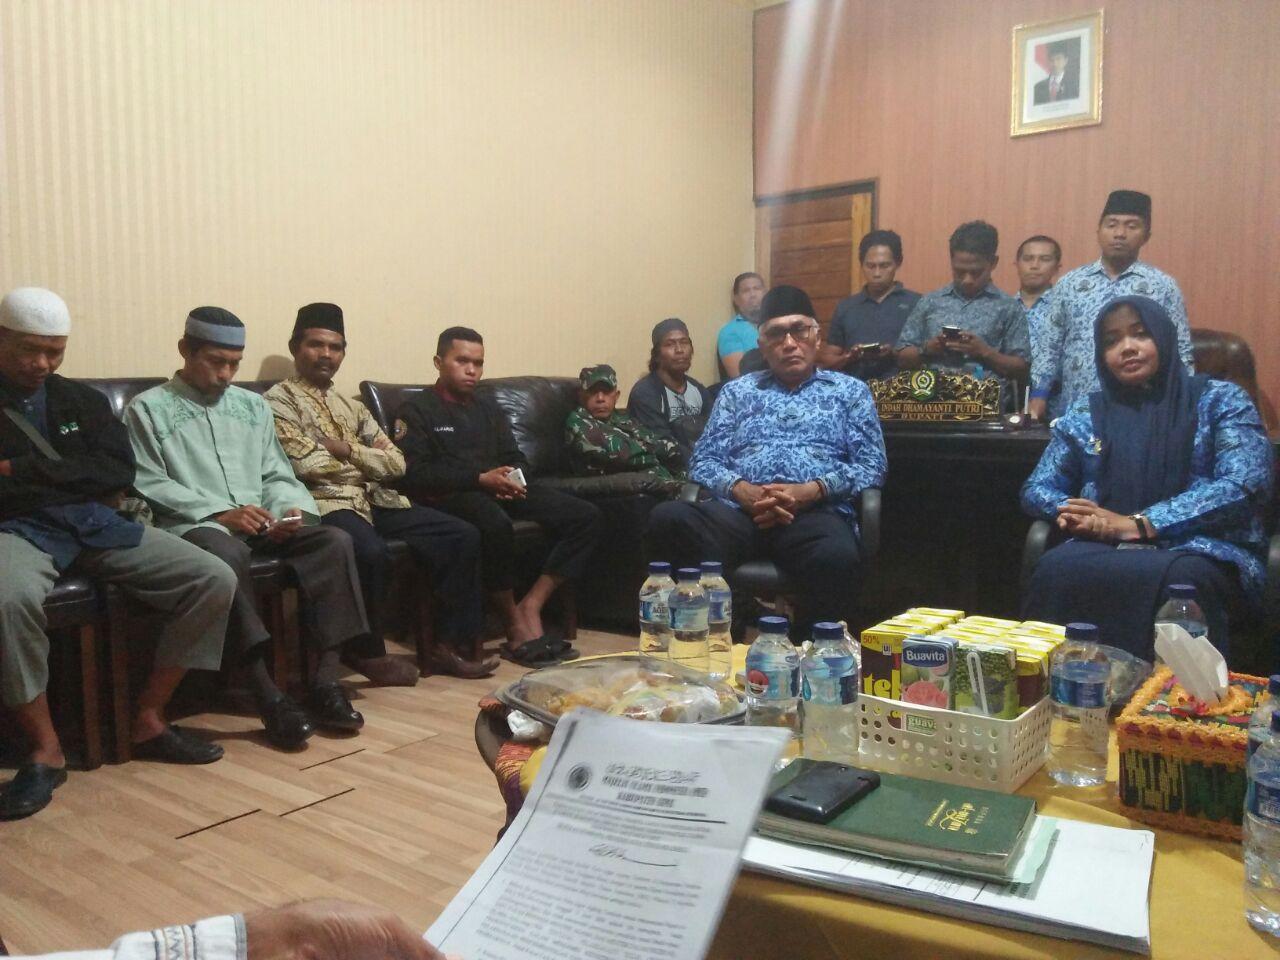 FUI Desak Bupati Bima Hentikan Pembangunan Pura Ilegal di Kecamatan Tambora